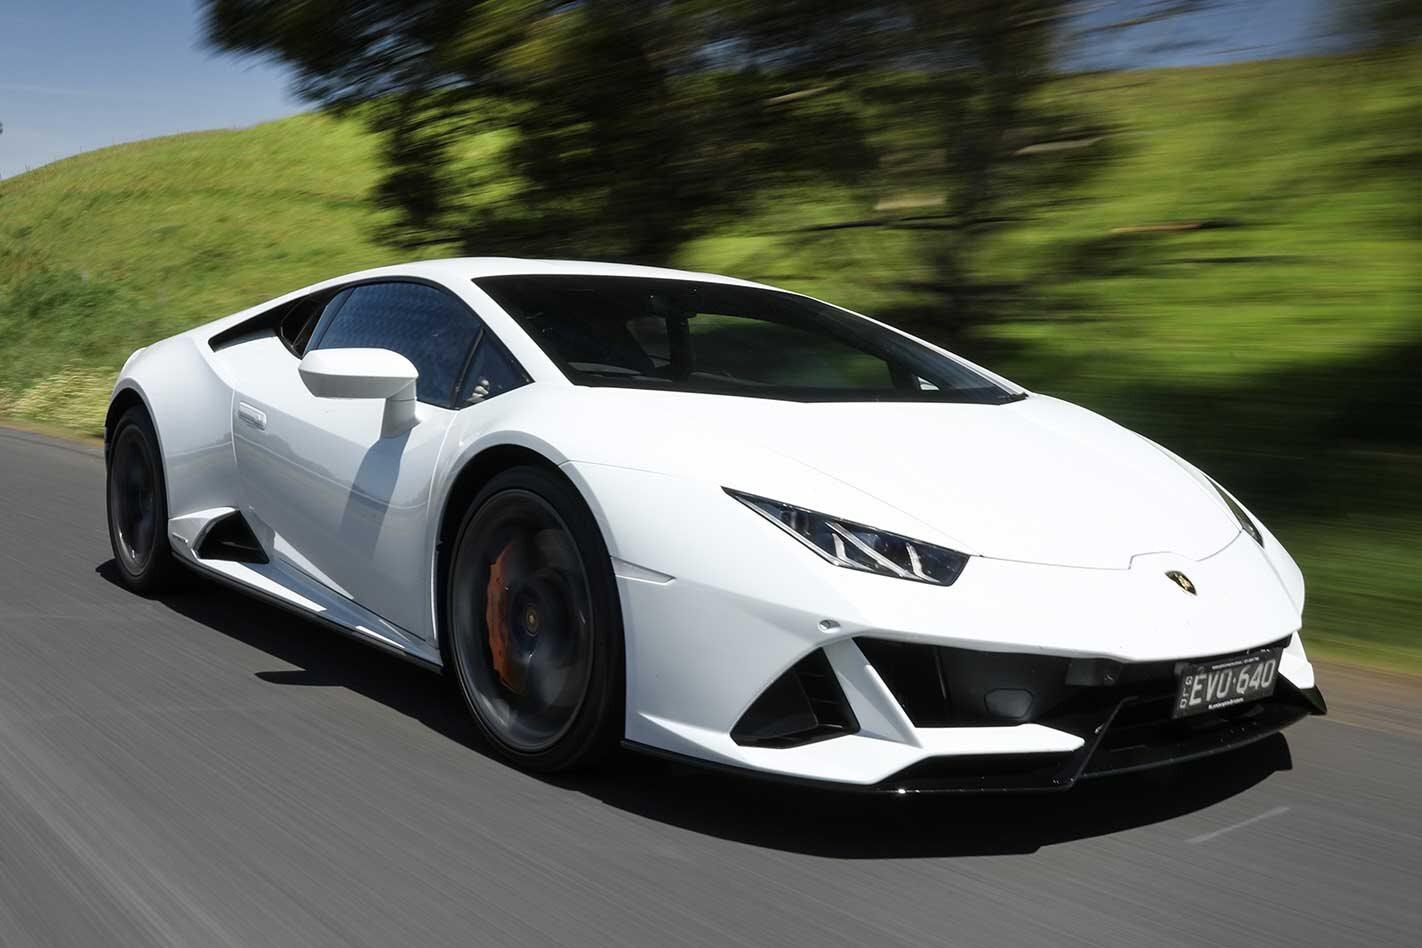 Lamborghini Huracan Evo review